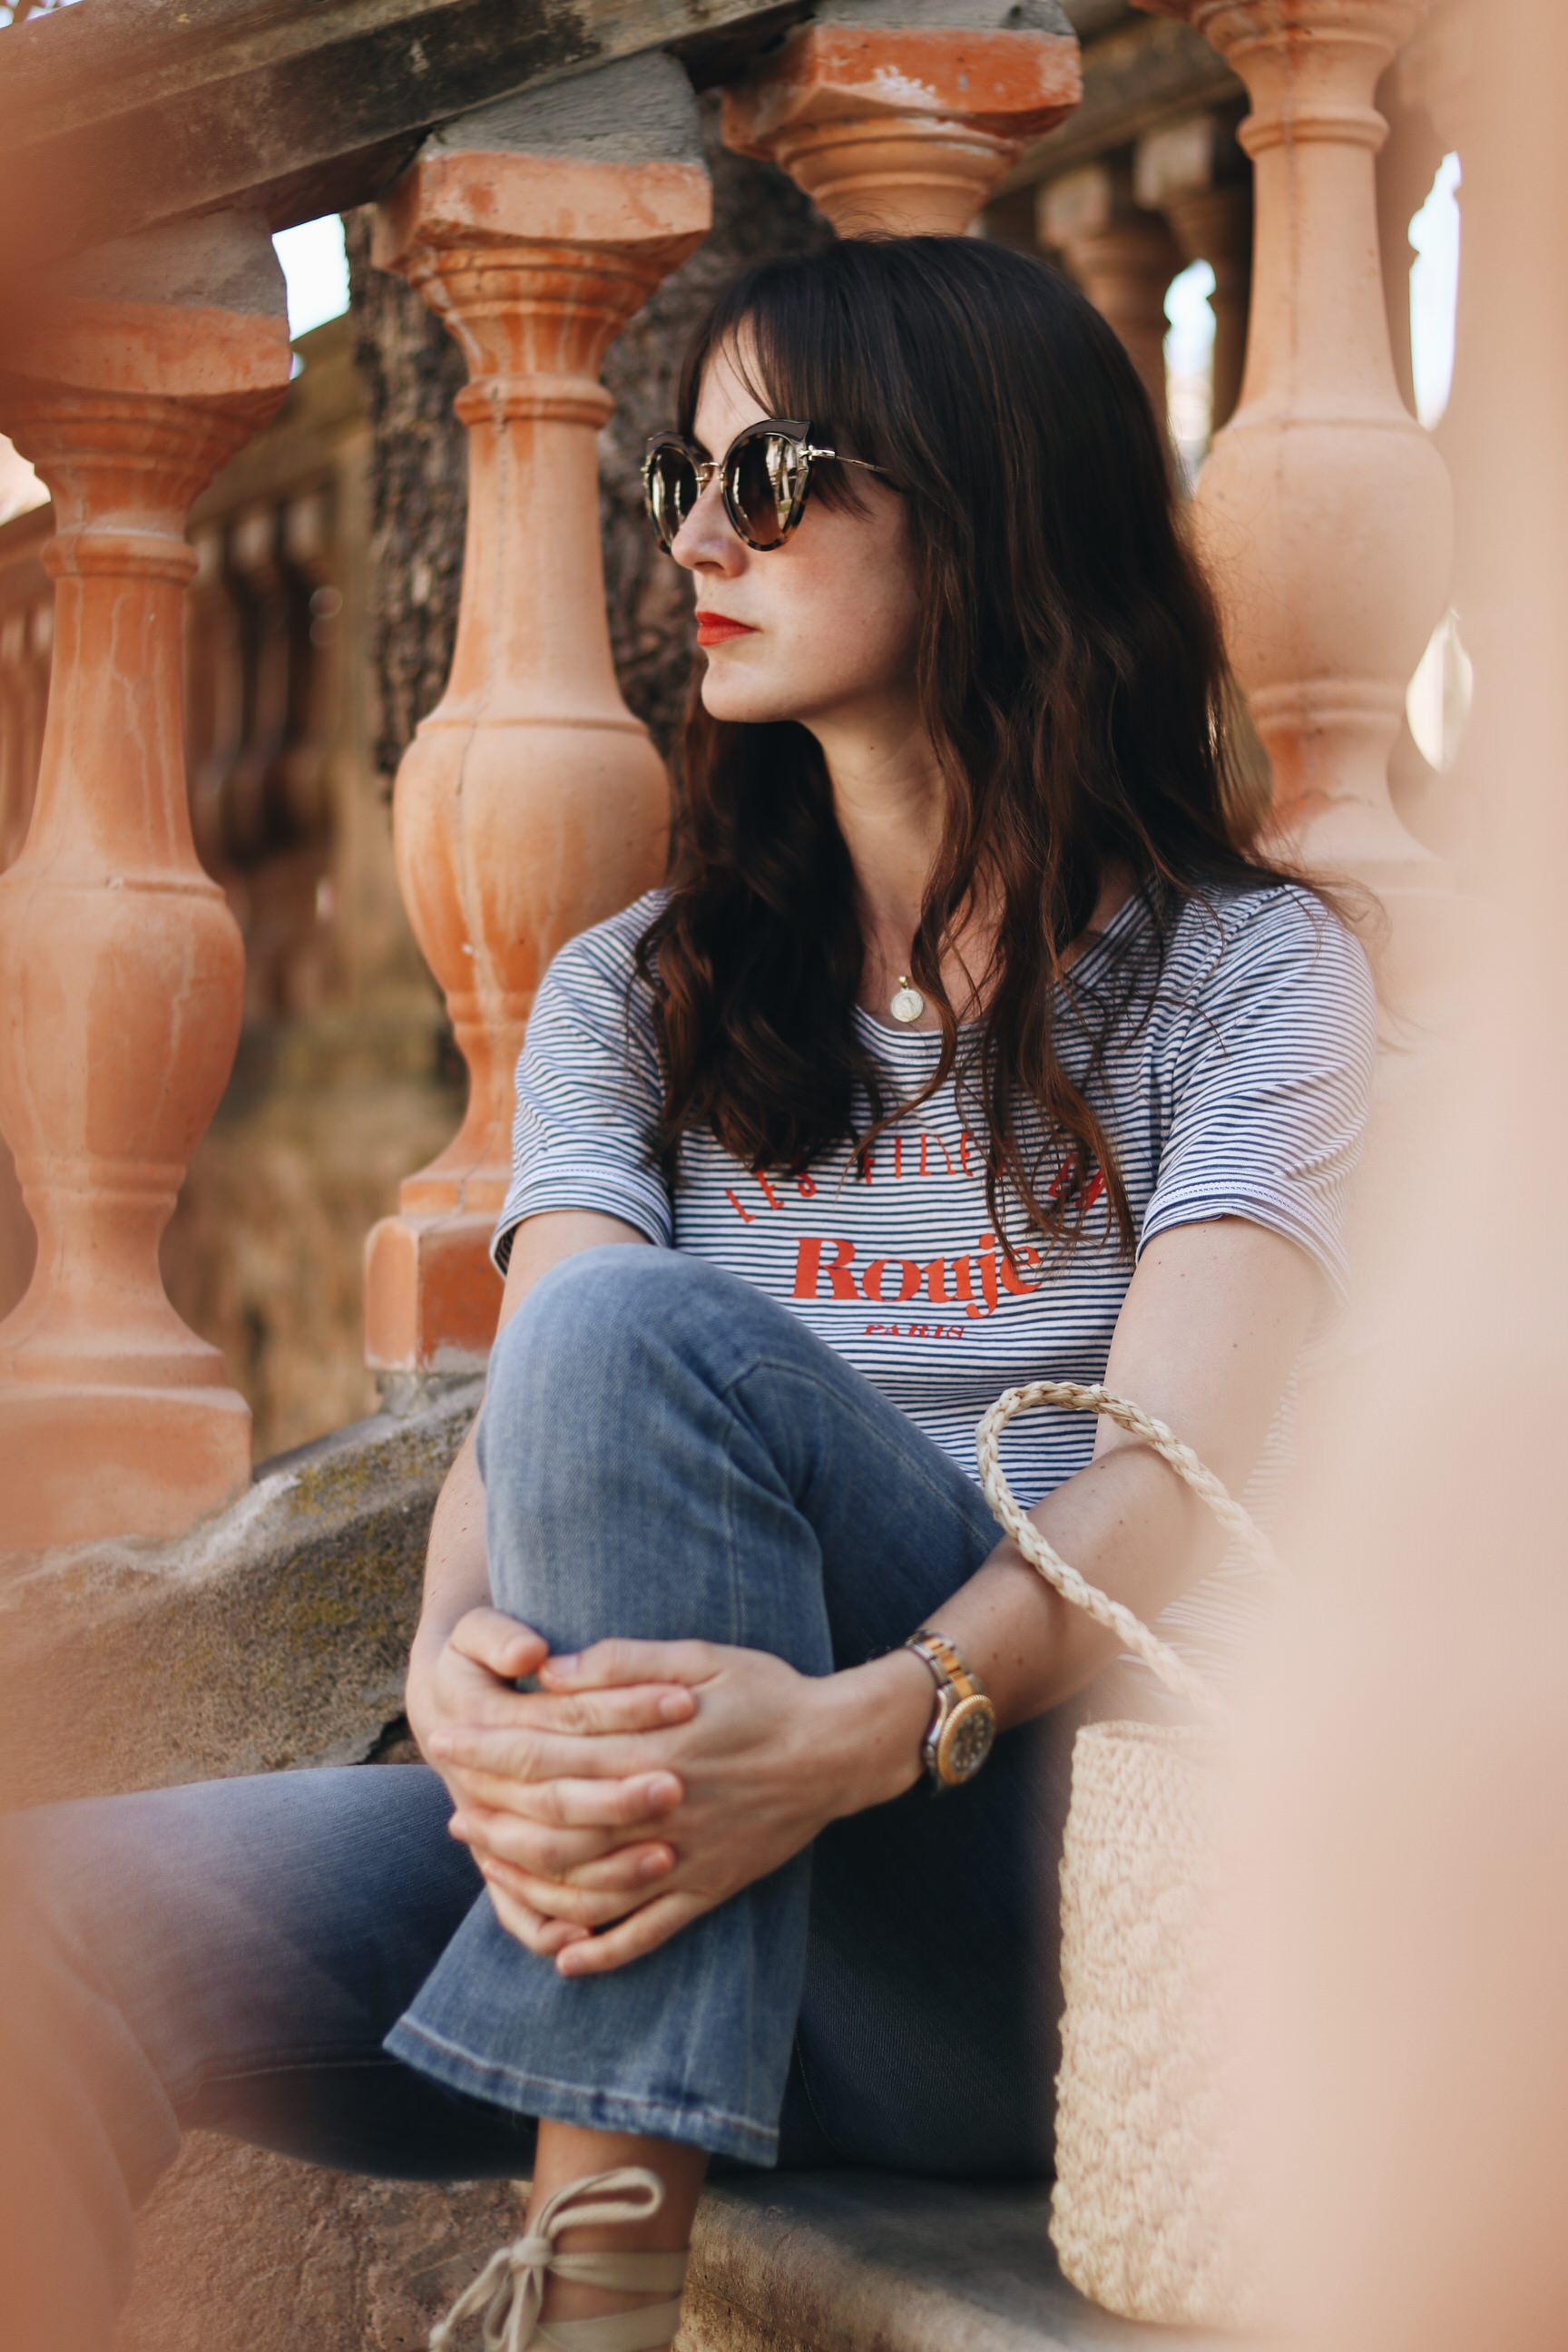 Neele Modebloggerin Streifen OBerteil Modetrends Kick Flare Jeans Outfit Modeblog